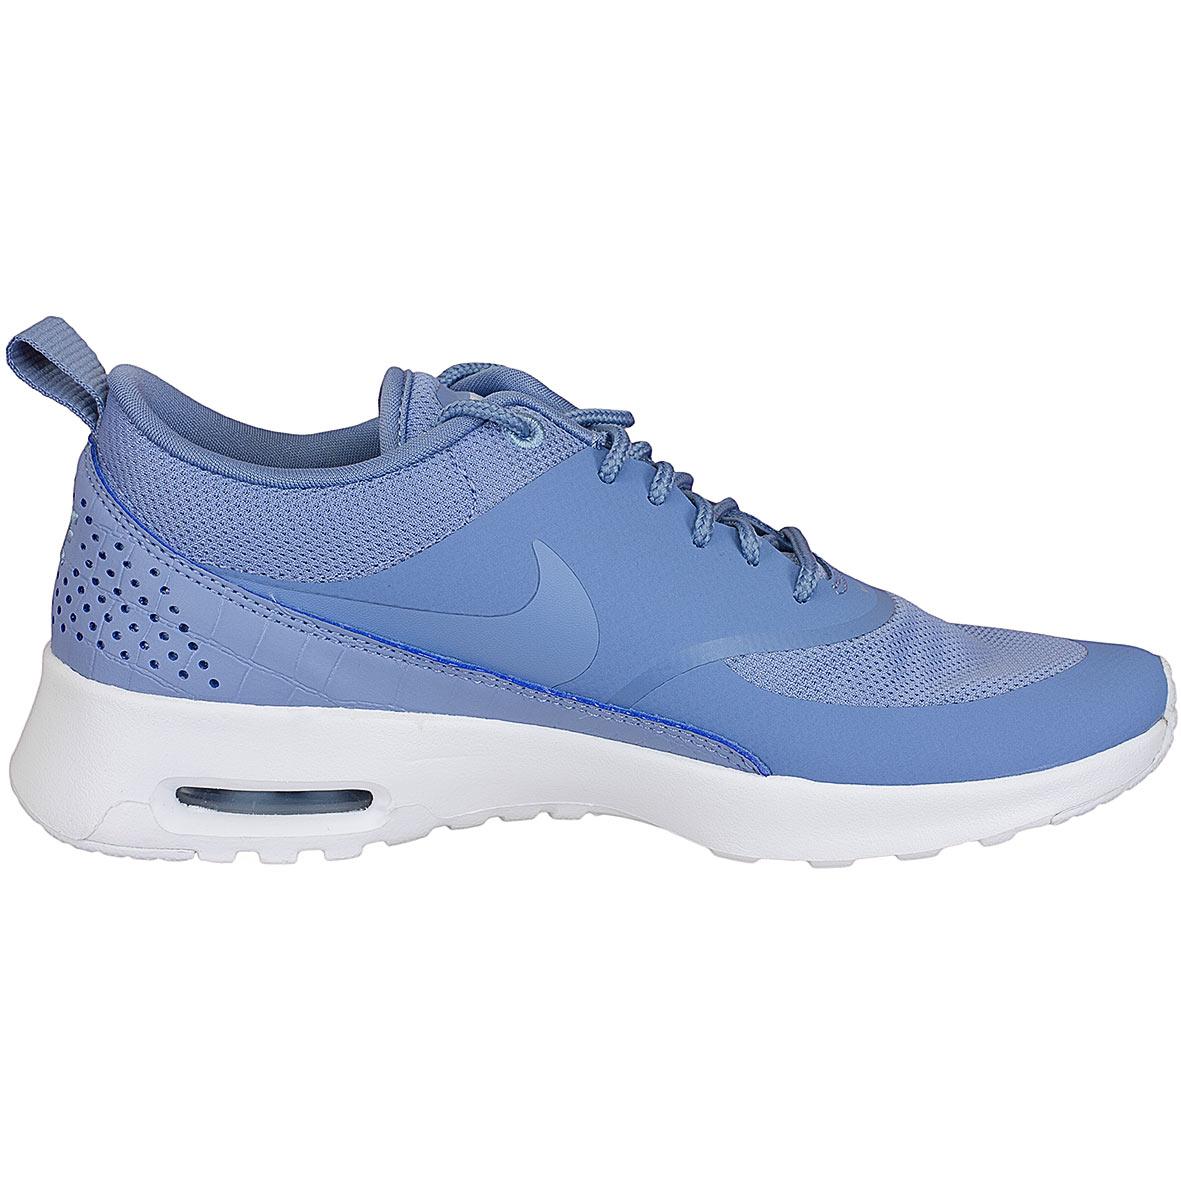 nike damen sneaker air max thea blau hier bestellen. Black Bedroom Furniture Sets. Home Design Ideas